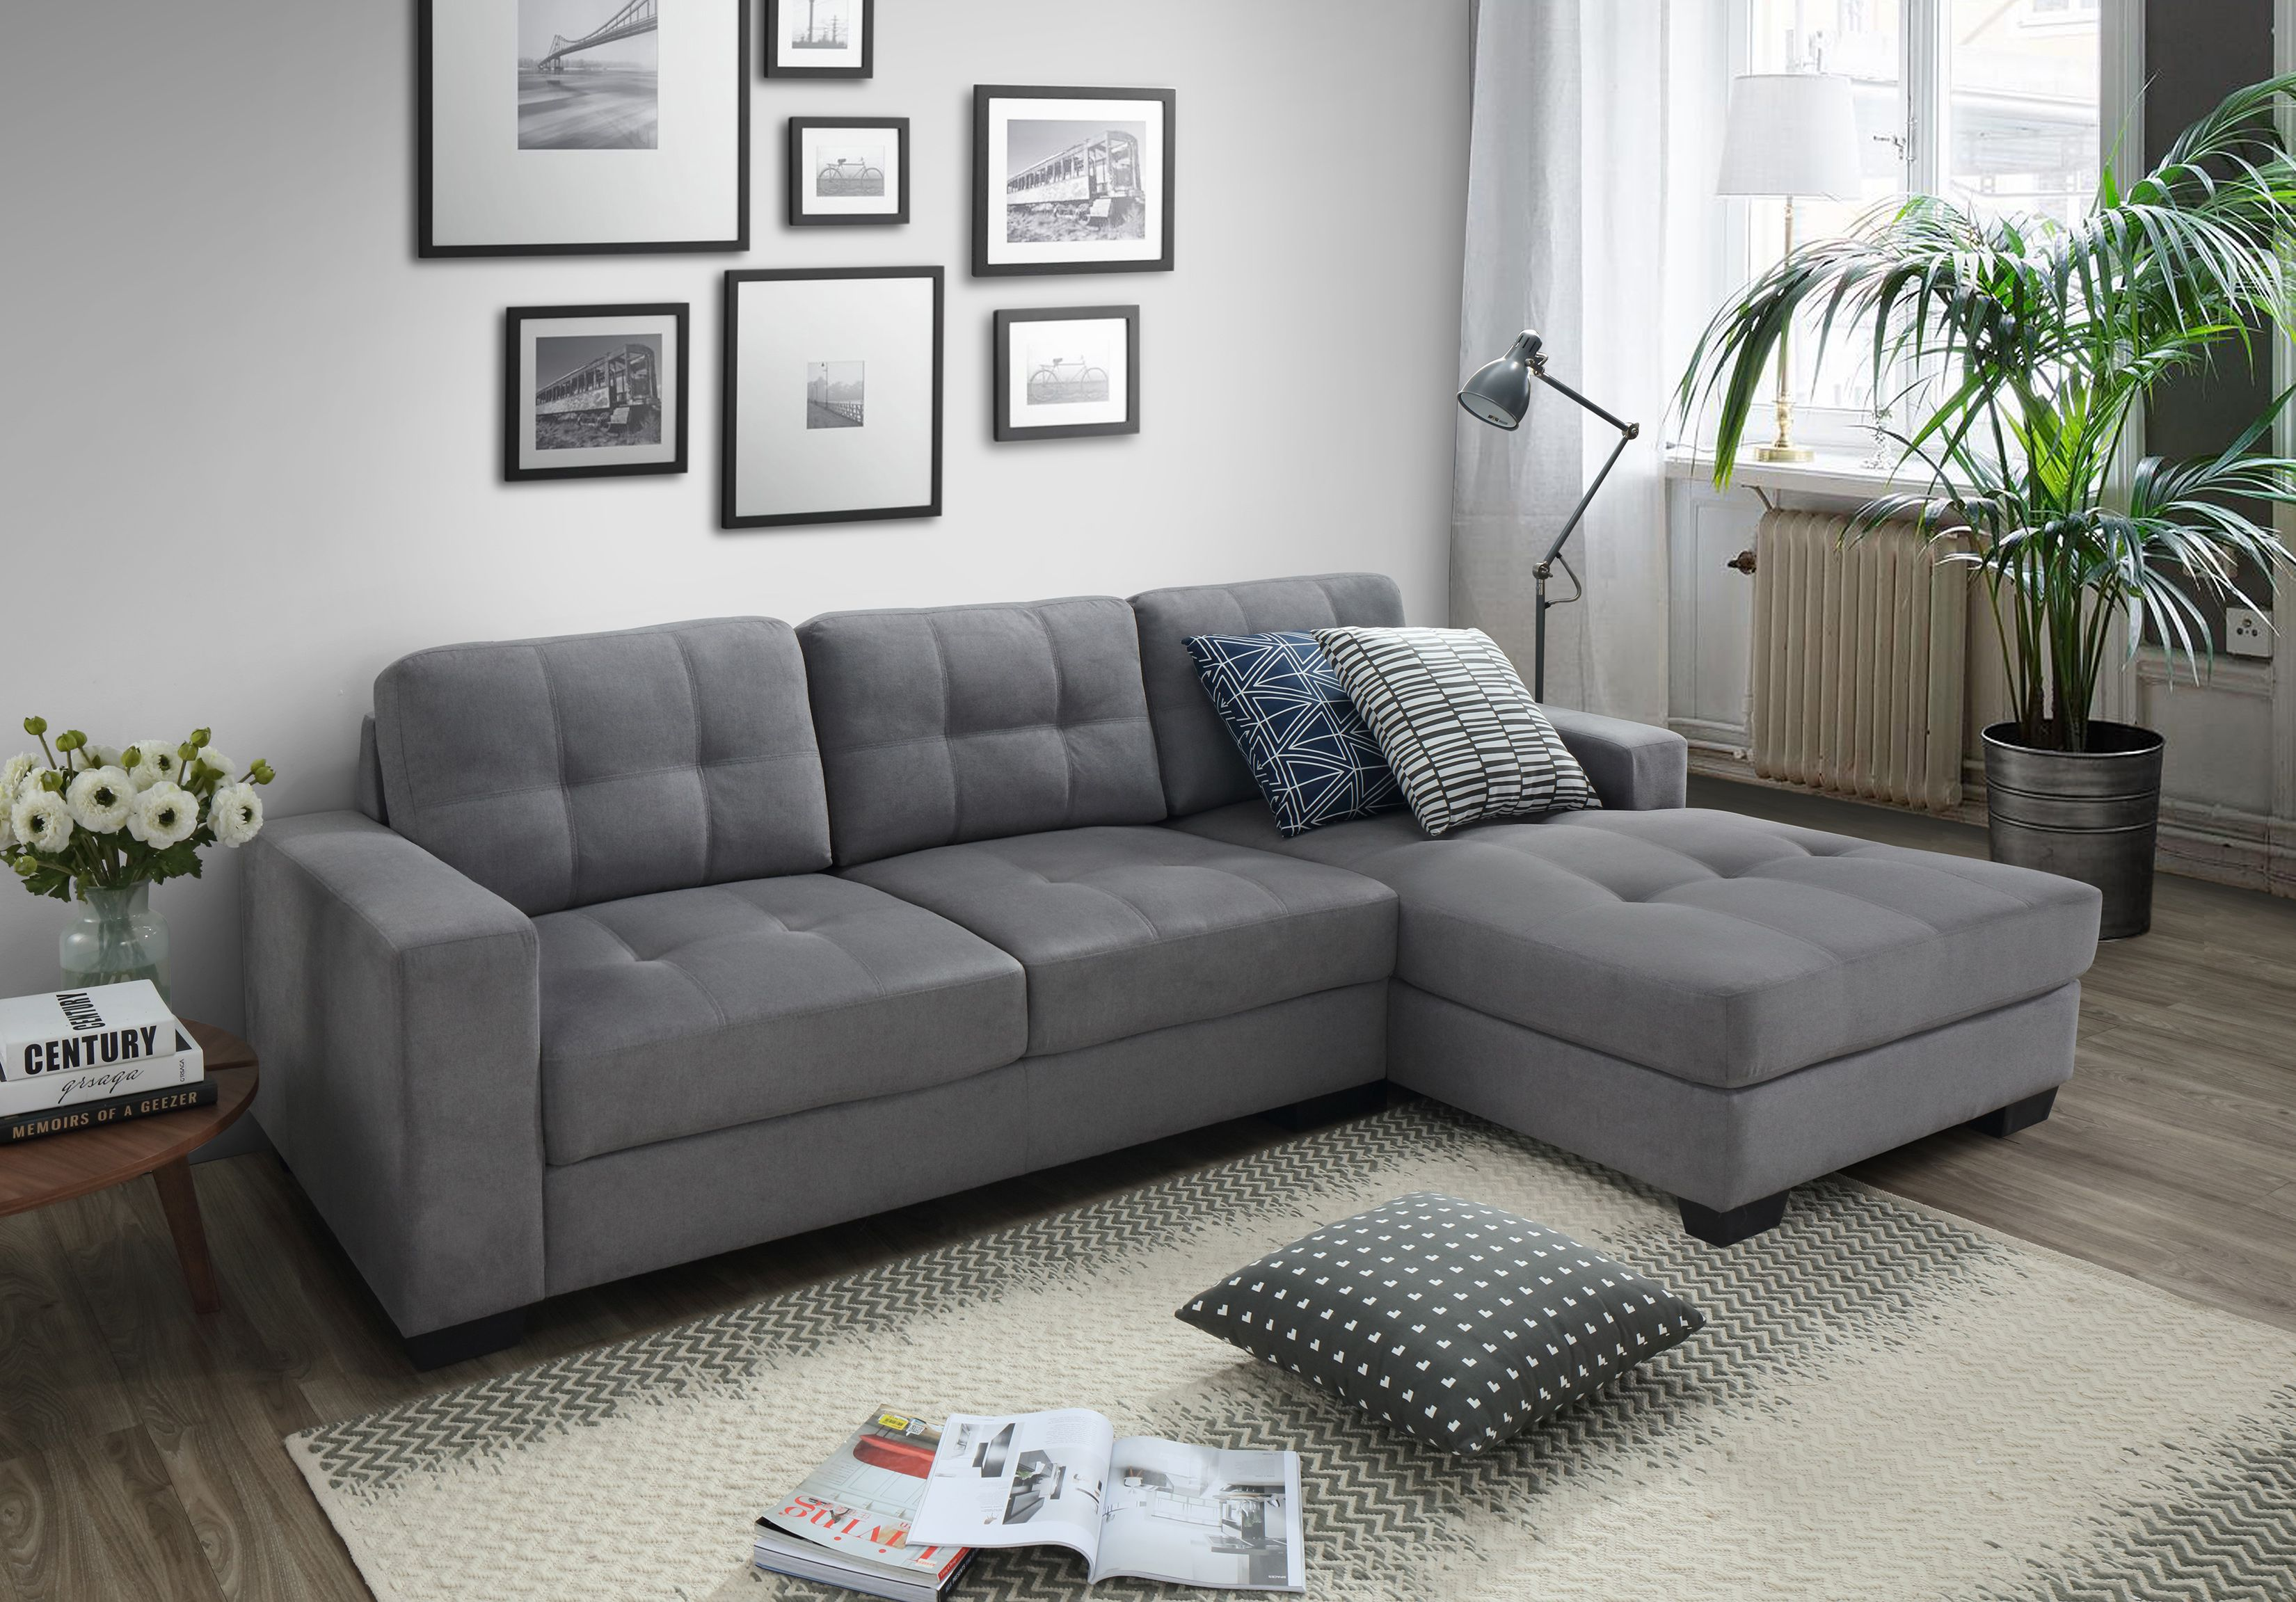 Astonishing Rome L Shape By Discount Decor Contact Us 011 616 2026 8 Machost Co Dining Chair Design Ideas Machostcouk